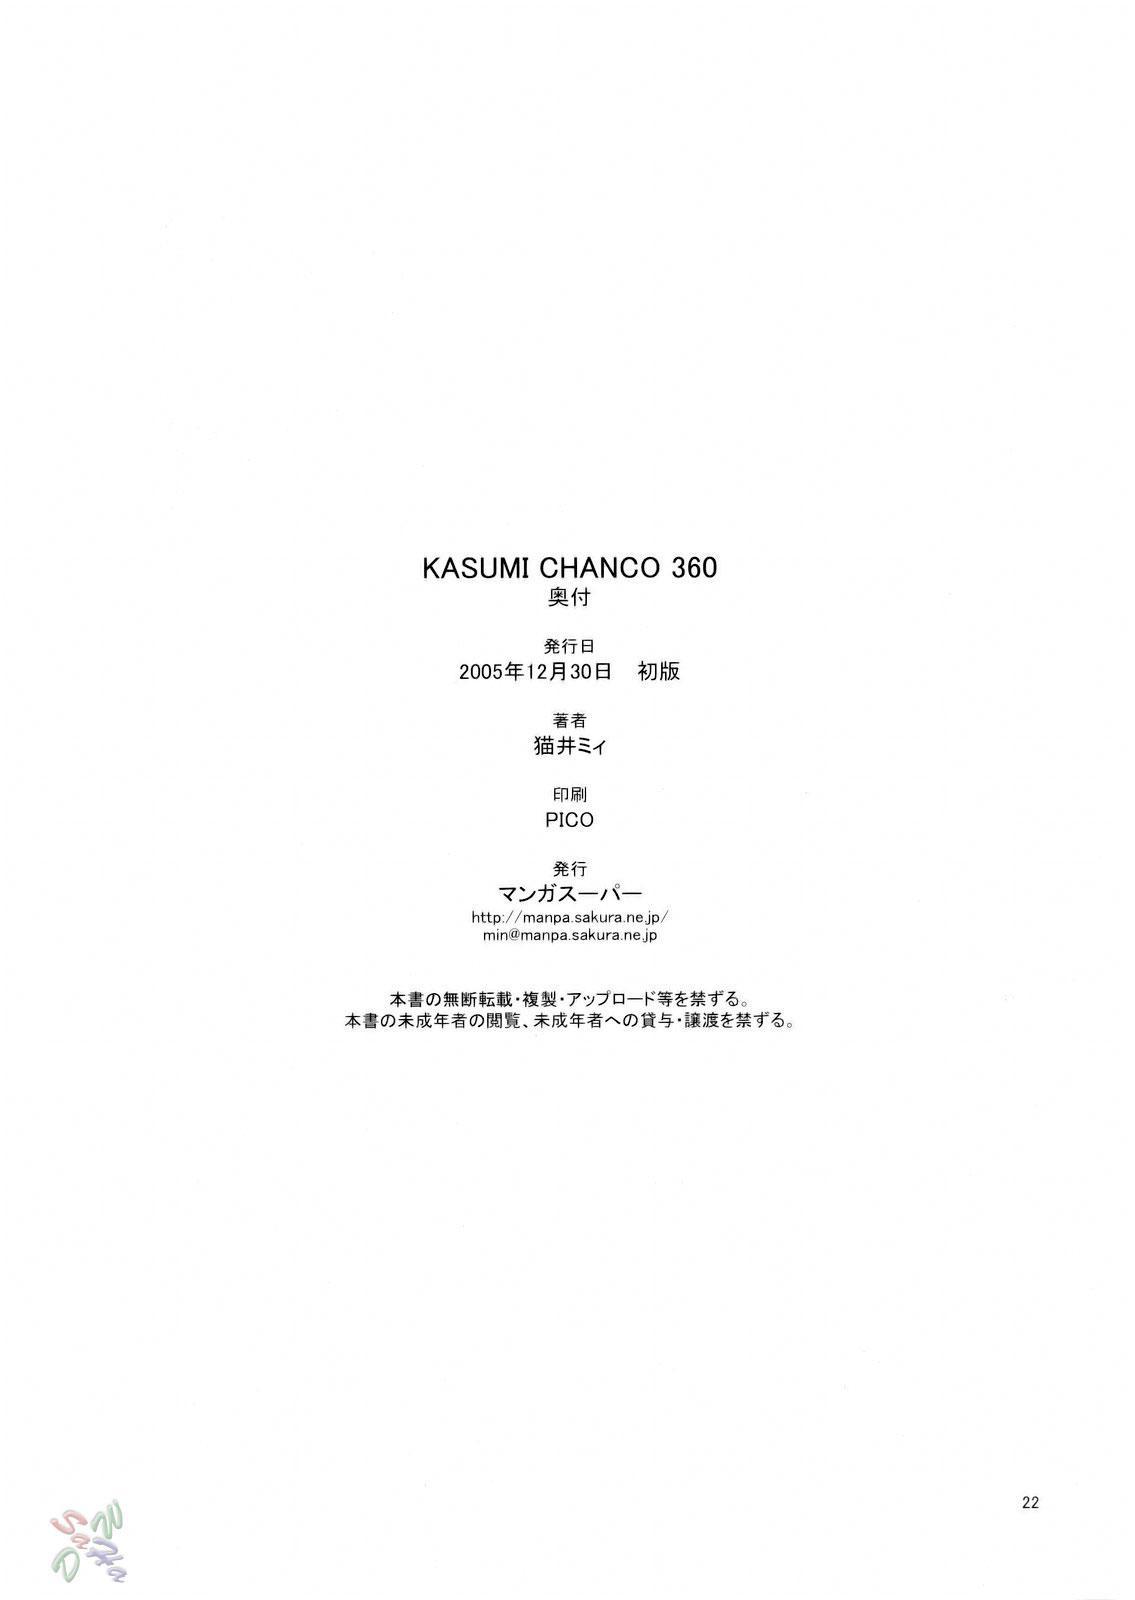 KASUMI CHANCO 360 19